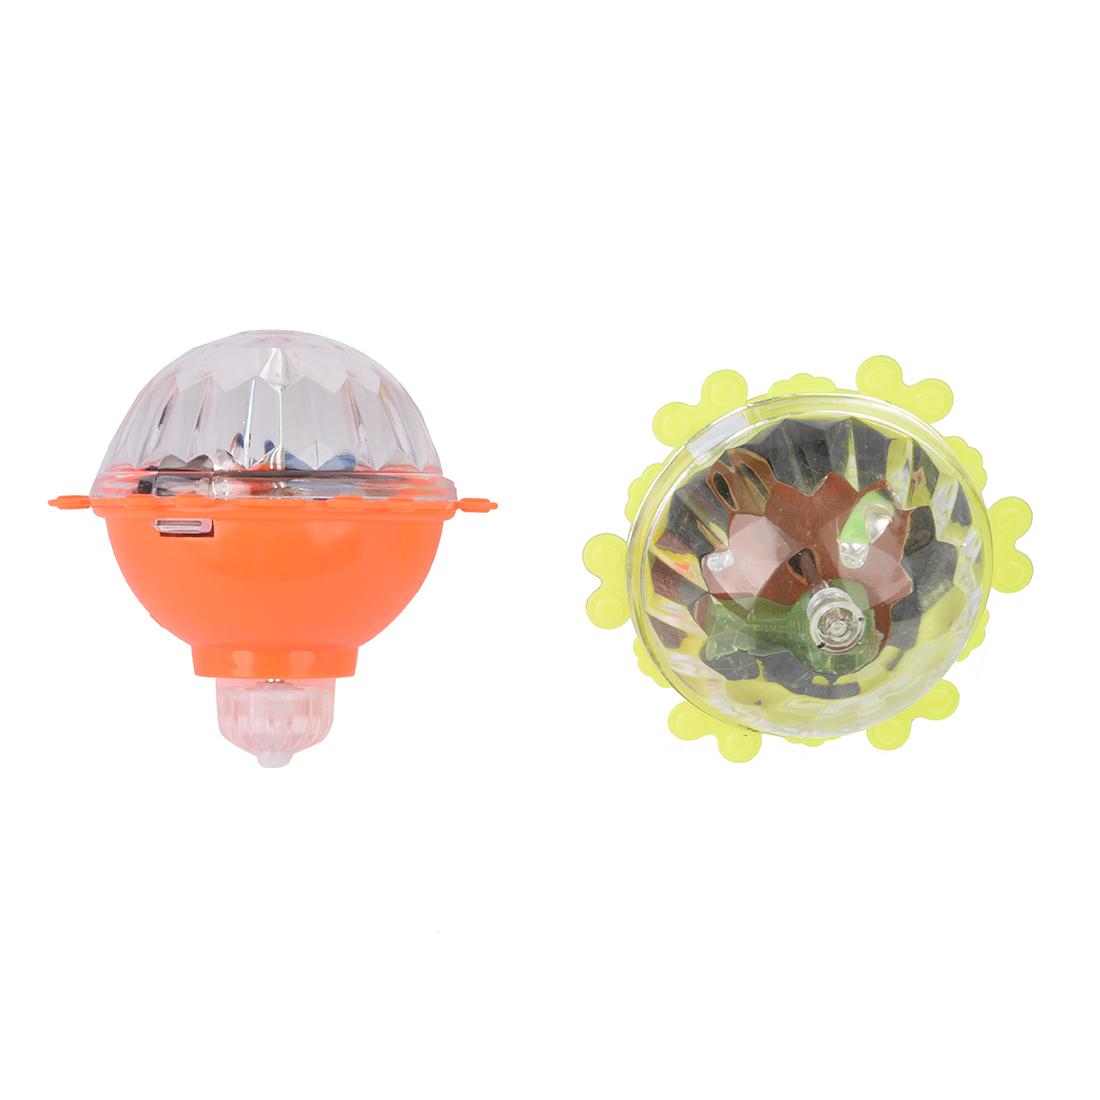 Juguete peonza de plastico luz flash colorido amarillo for Juguetes de plastico